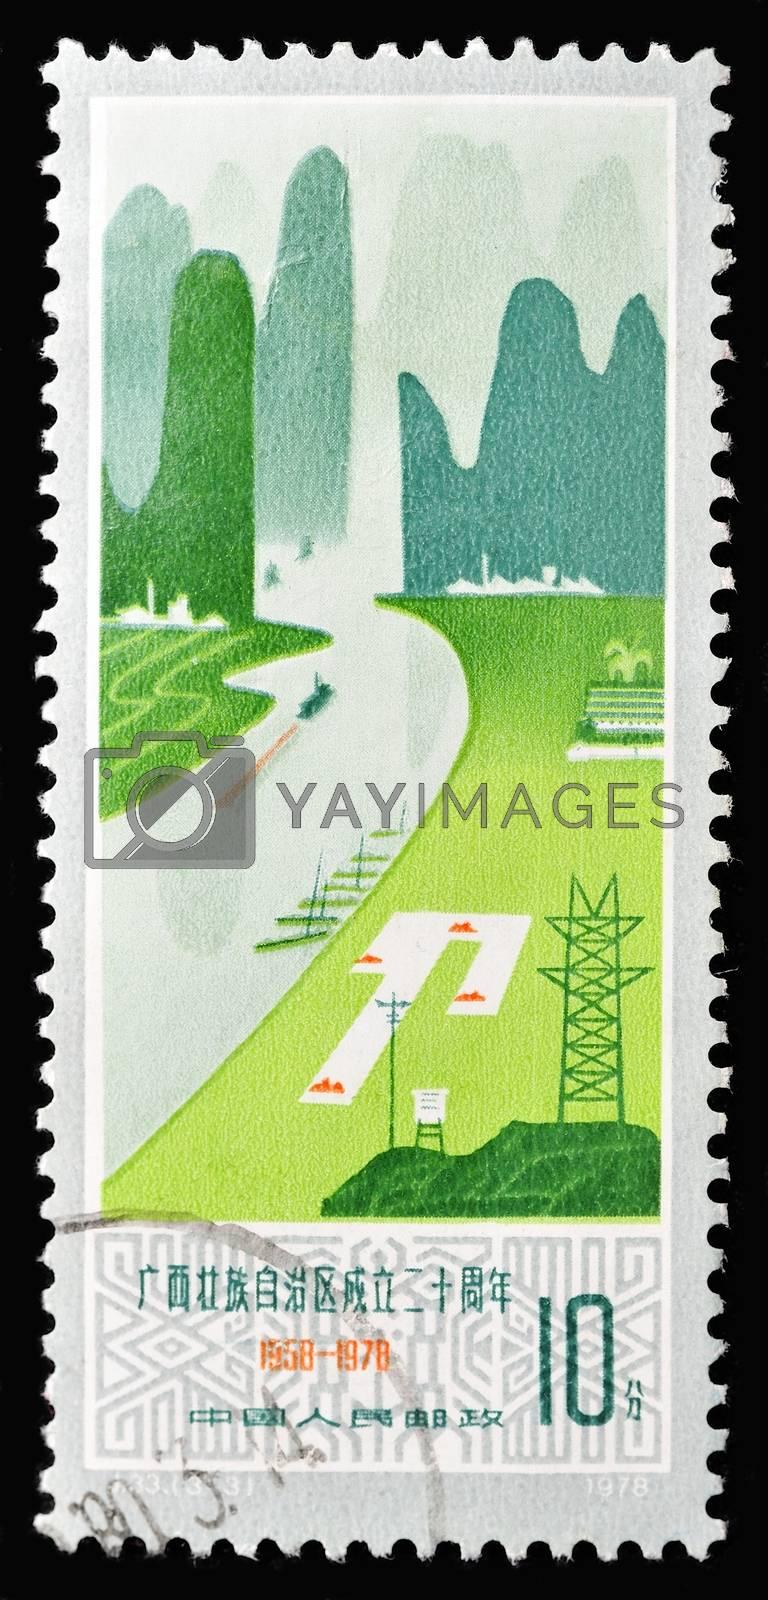 CHINA - CIRCA 1967: A stamp printed in China shows a landscape, circa 1967